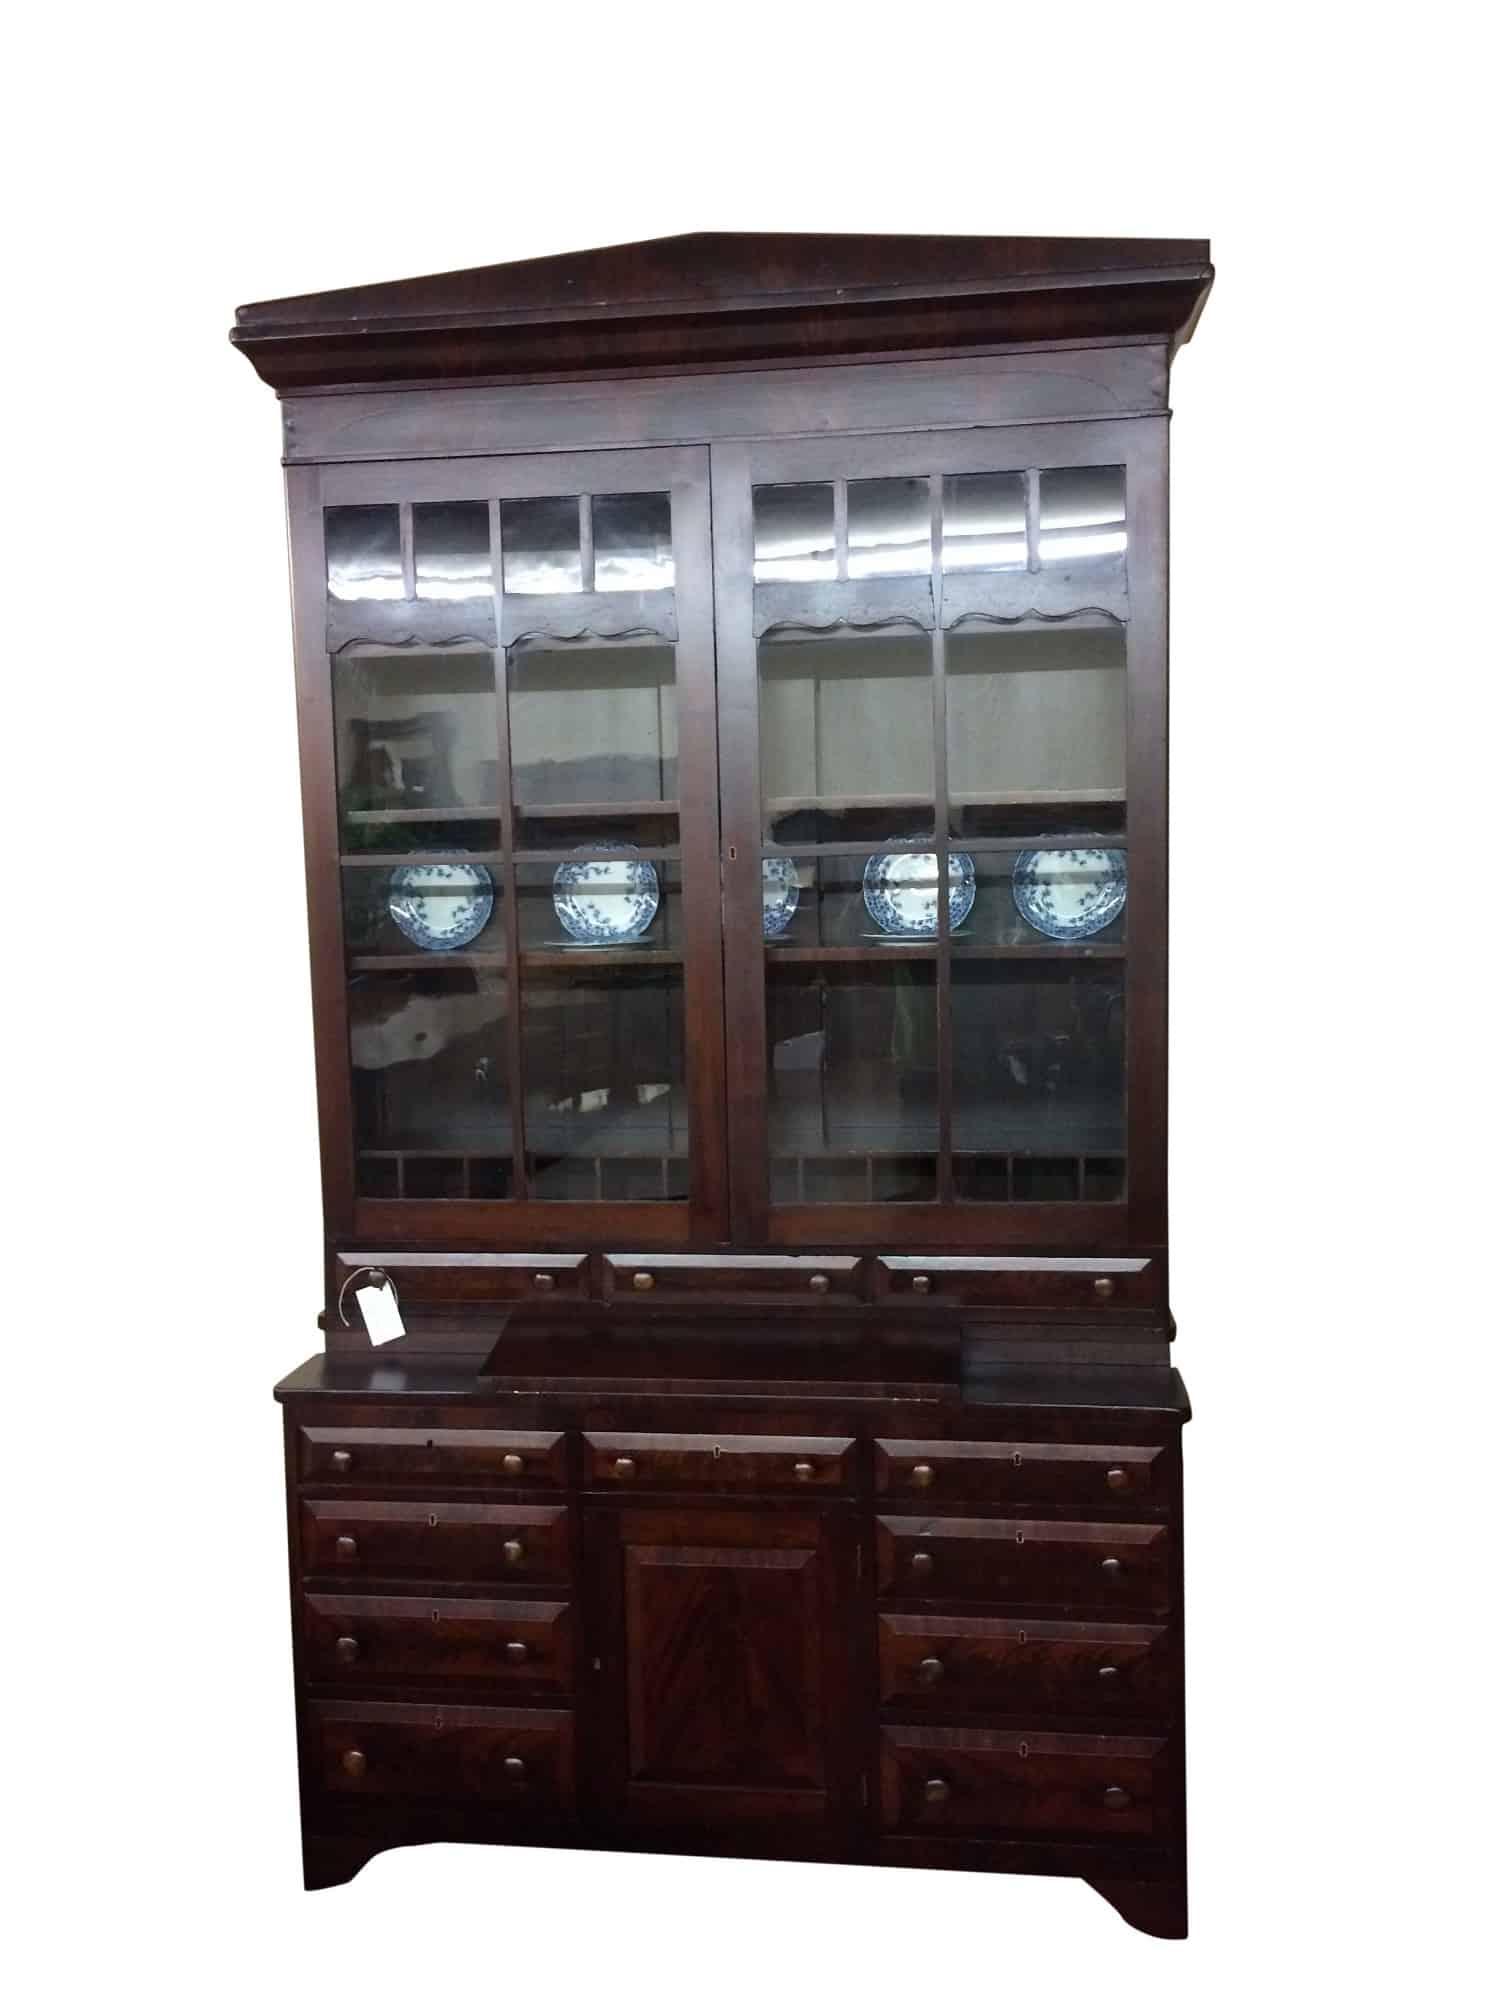 Antique Secretary Desk With Hutch - Antique Secretary Desk With Hutch ⋆ Bohemian's